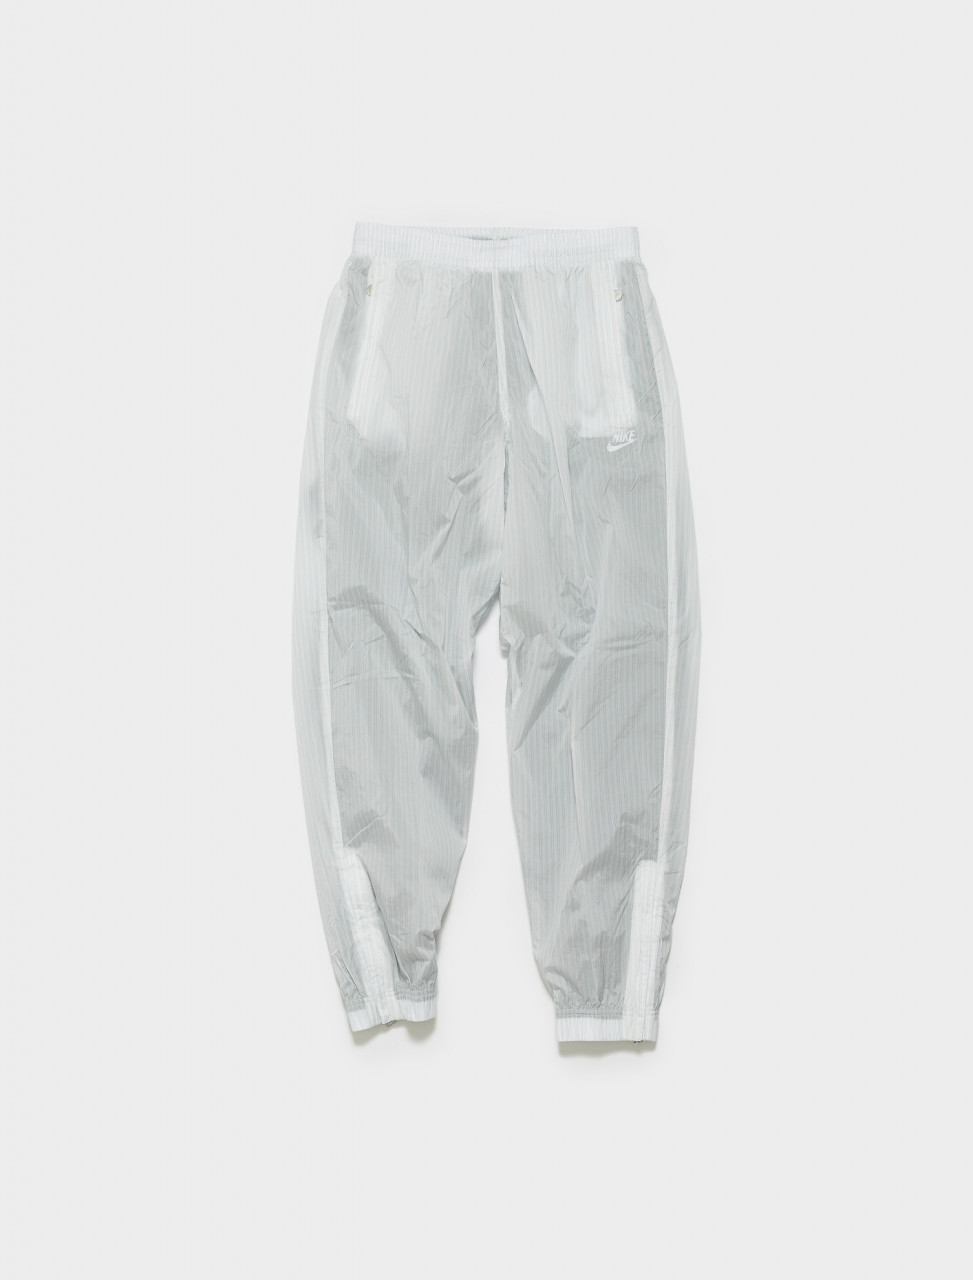 DH6585-100 NIKE X KIM JONES TRACK PANTS IN WHITE